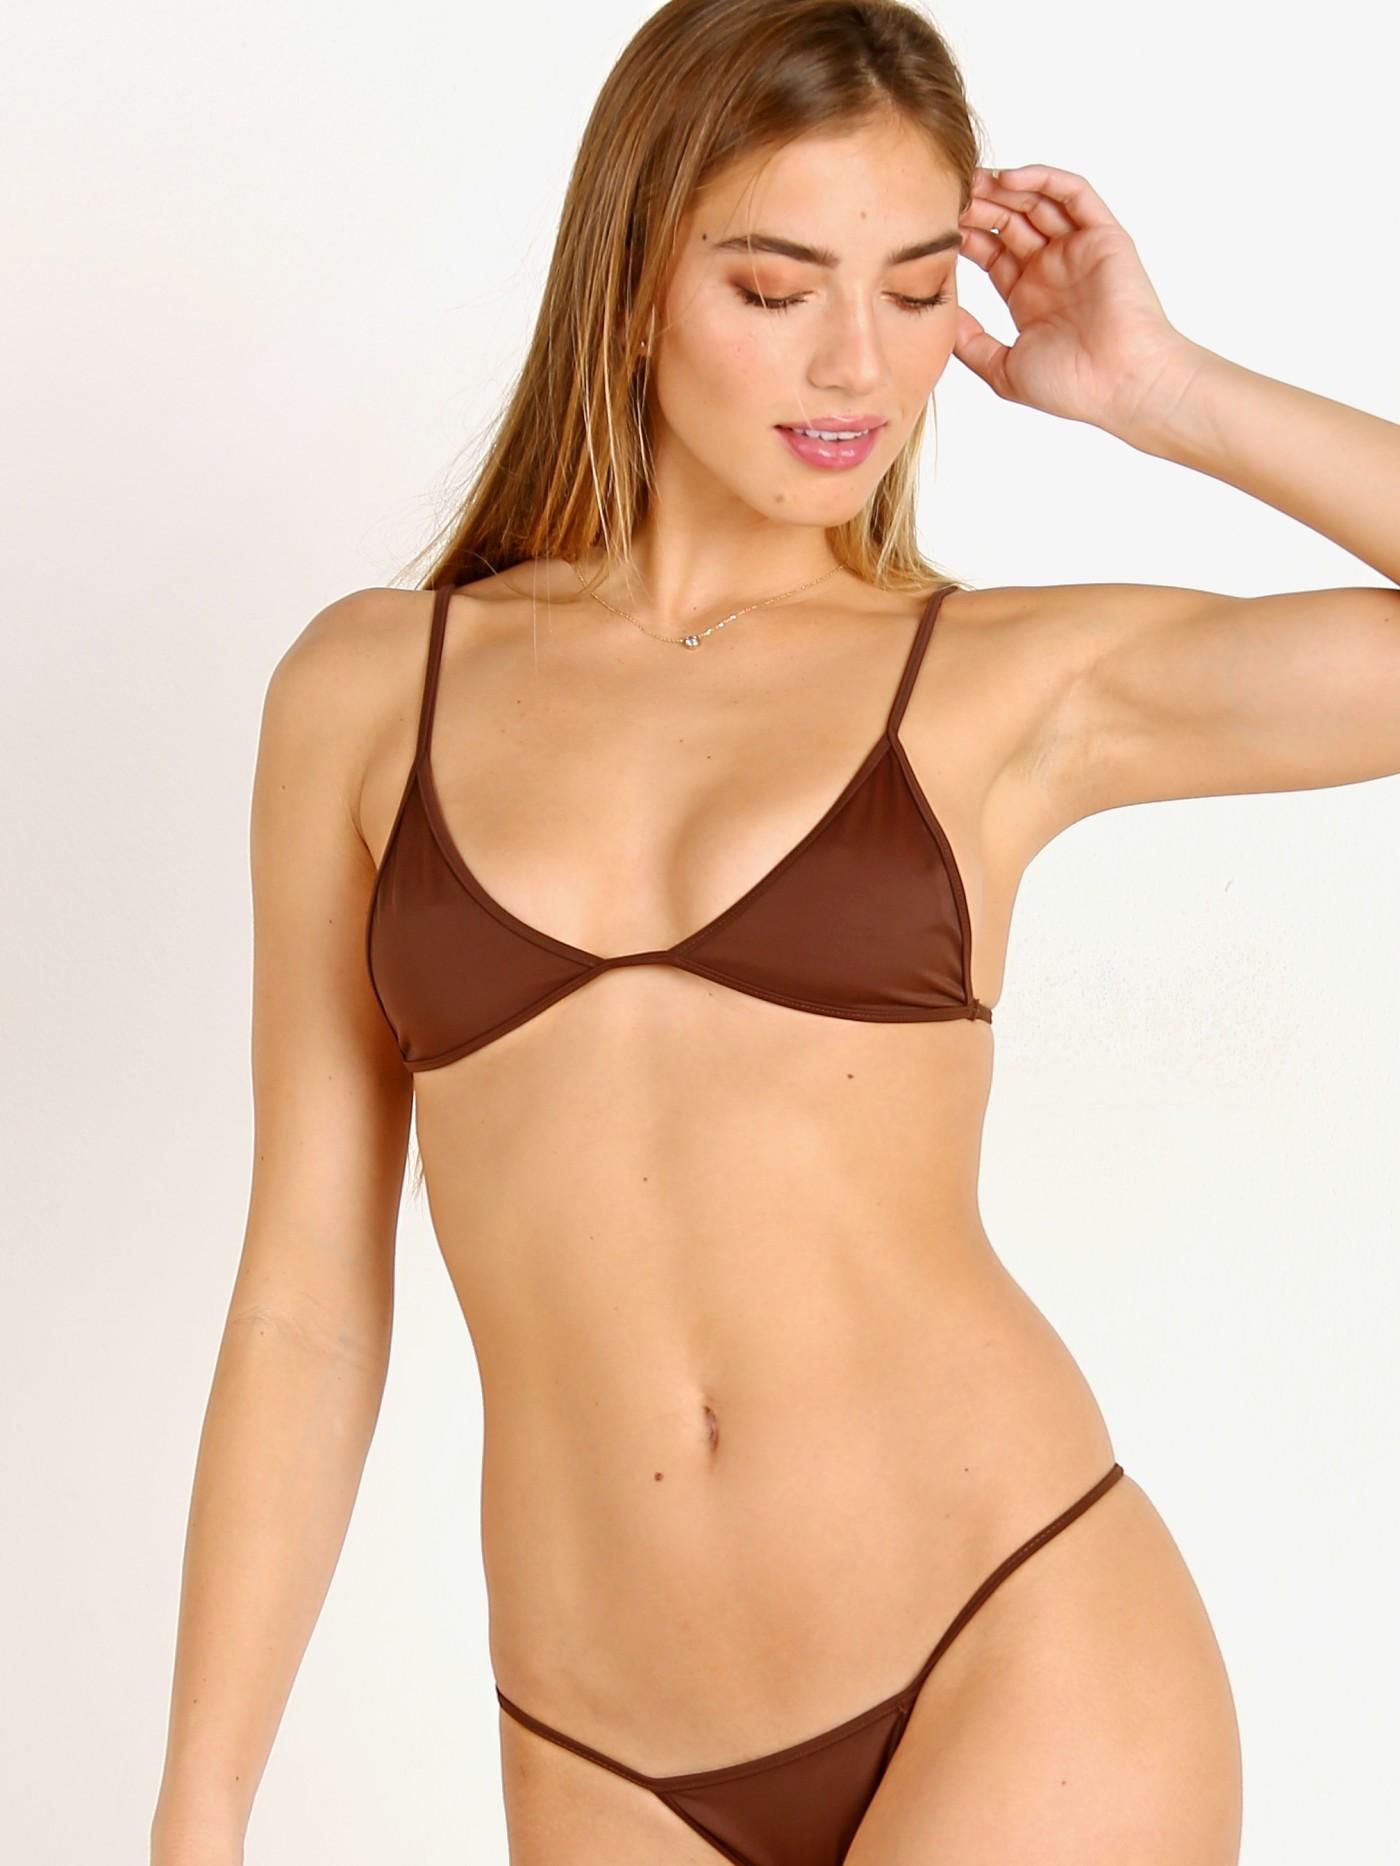 c93271944b2ba3 Kaohs Kelly Bikini Top Brown 822T - Free Shipping at Largo Drive